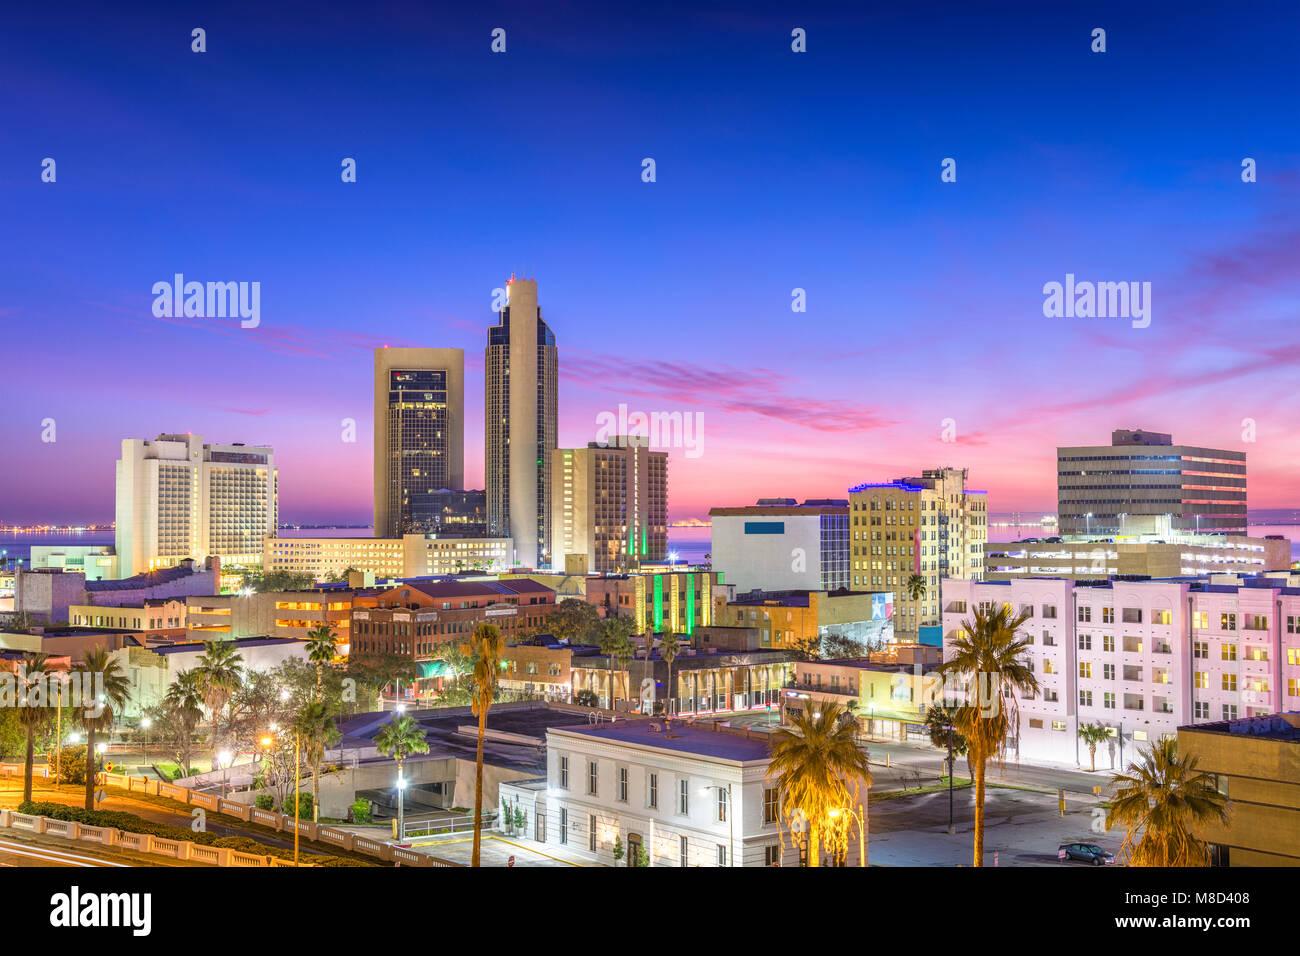 Corpus Christi, Texas, USA Skyline at dusk. - Stock Image